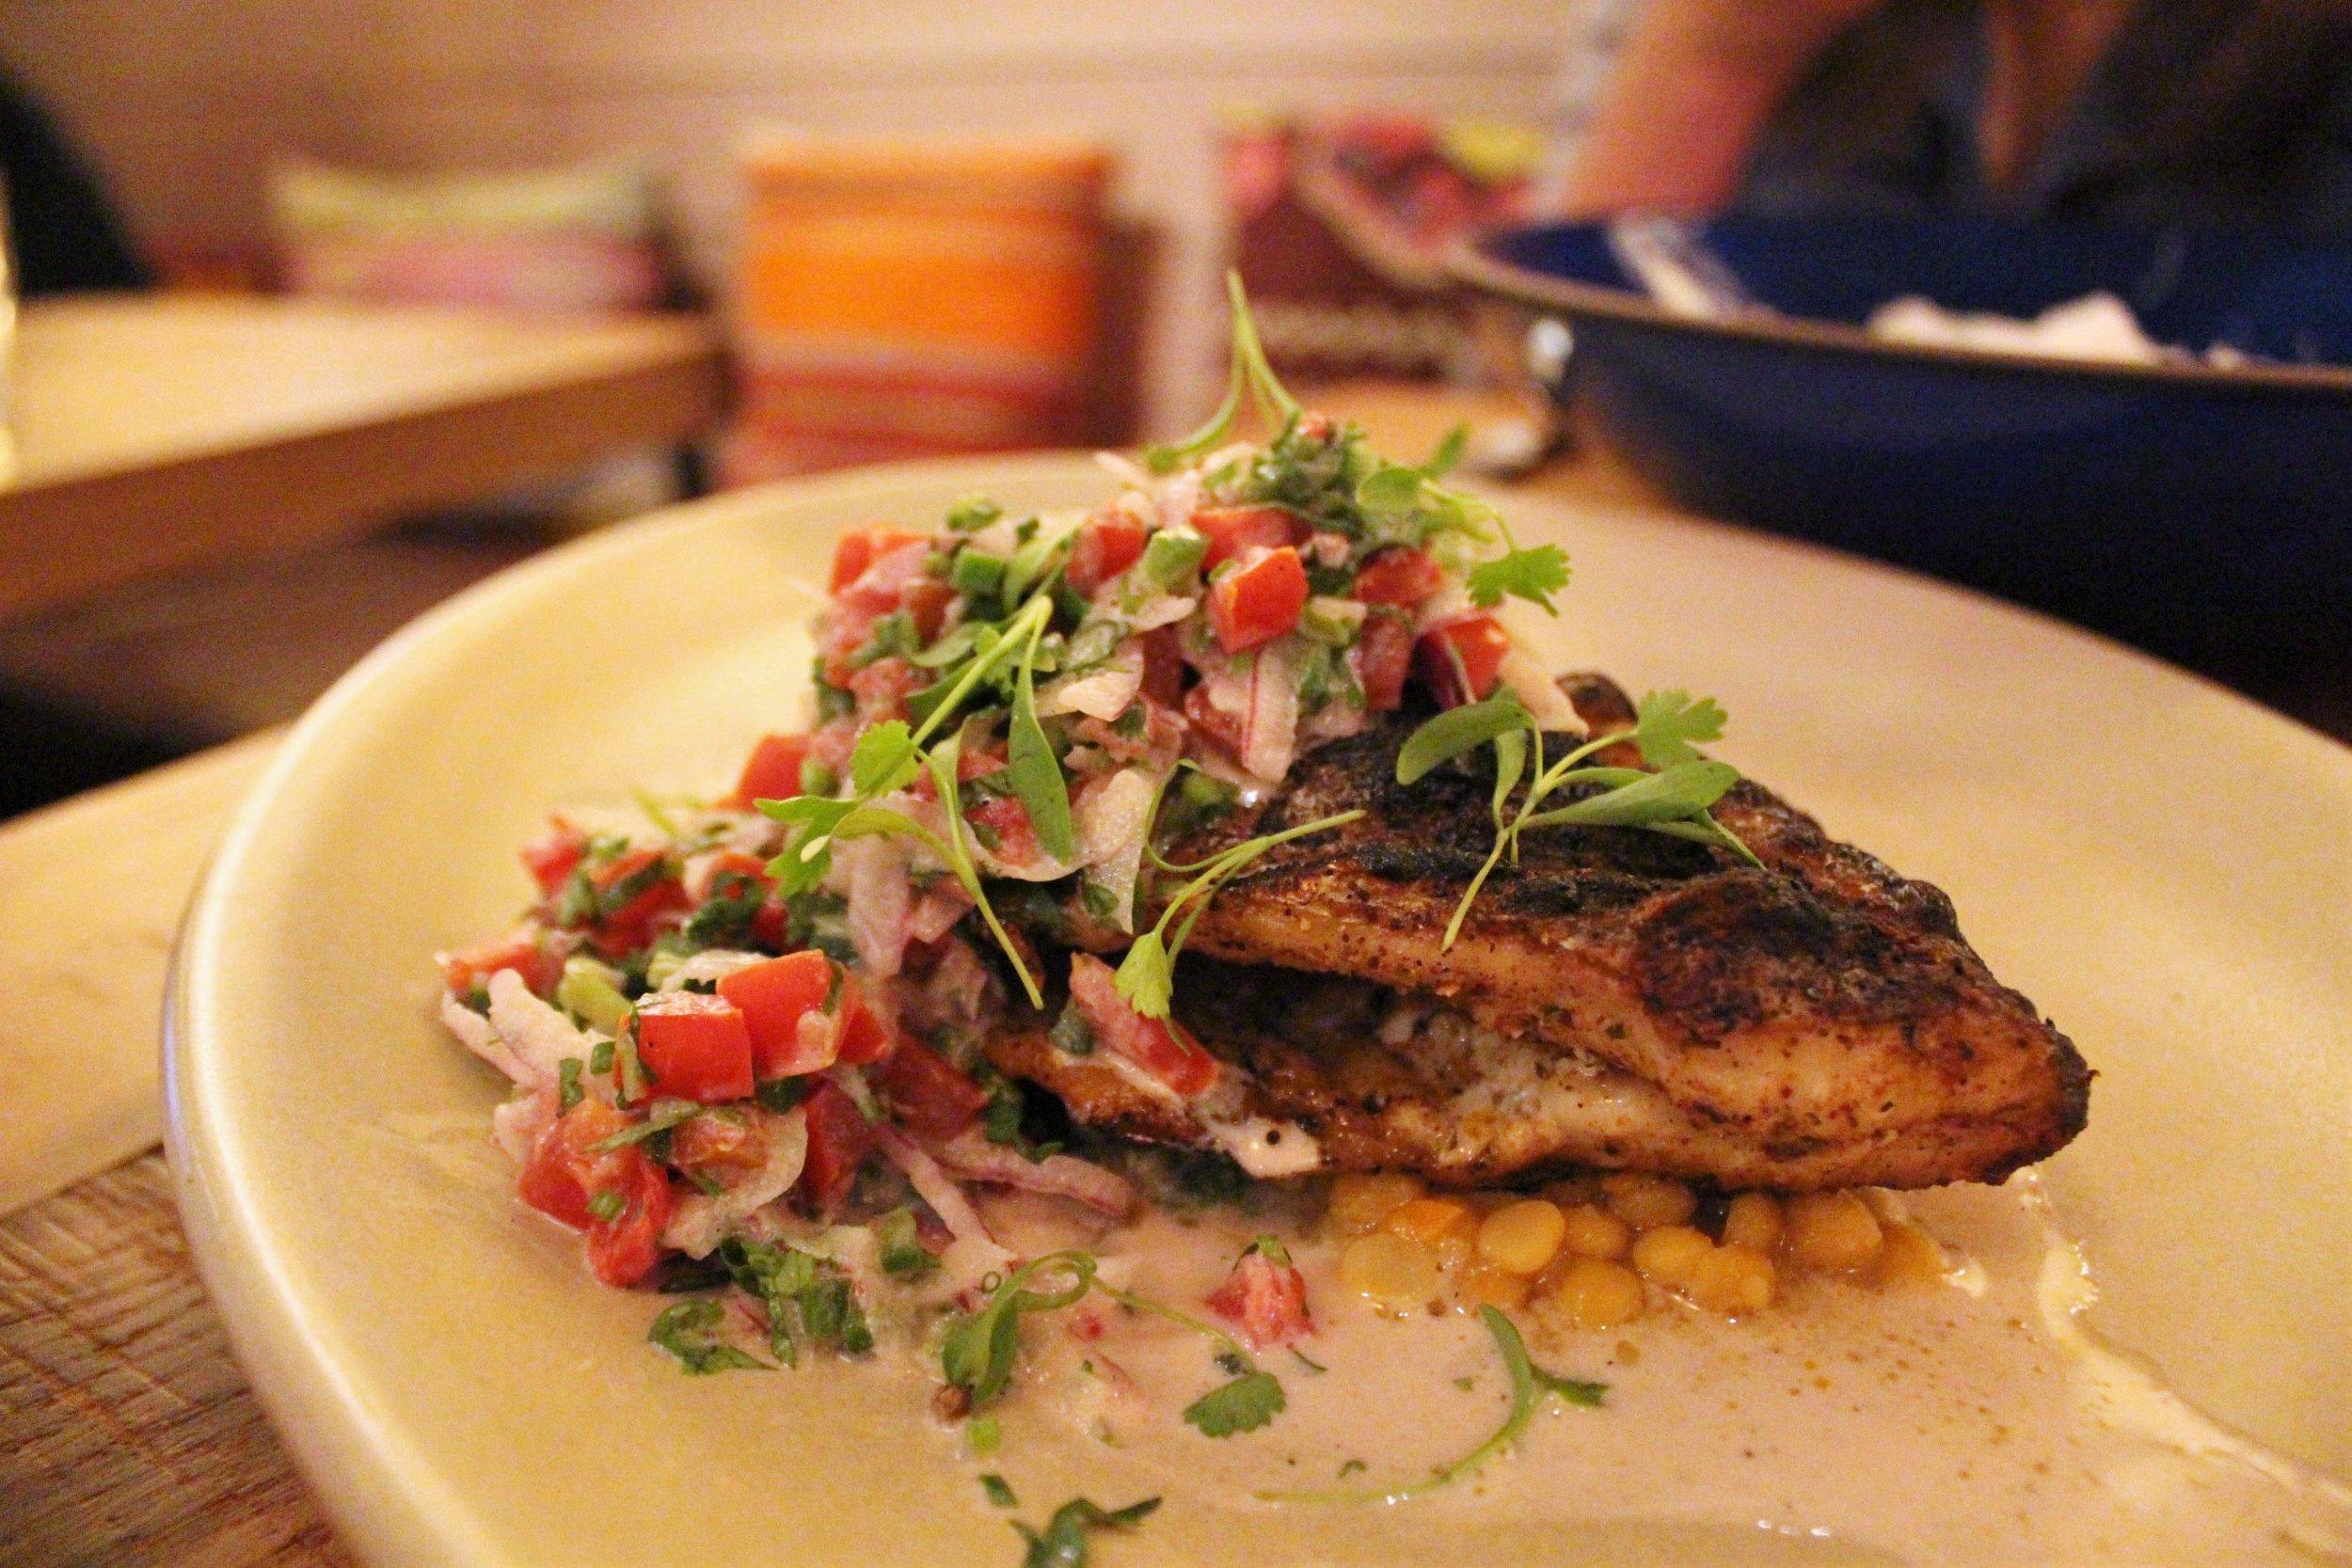 Whole Daily Fish: Grecian Dorade, Chana Dal Indian Yellow Lentil, Ajwain, Charred Garlic Yogurt Pico De Gallo